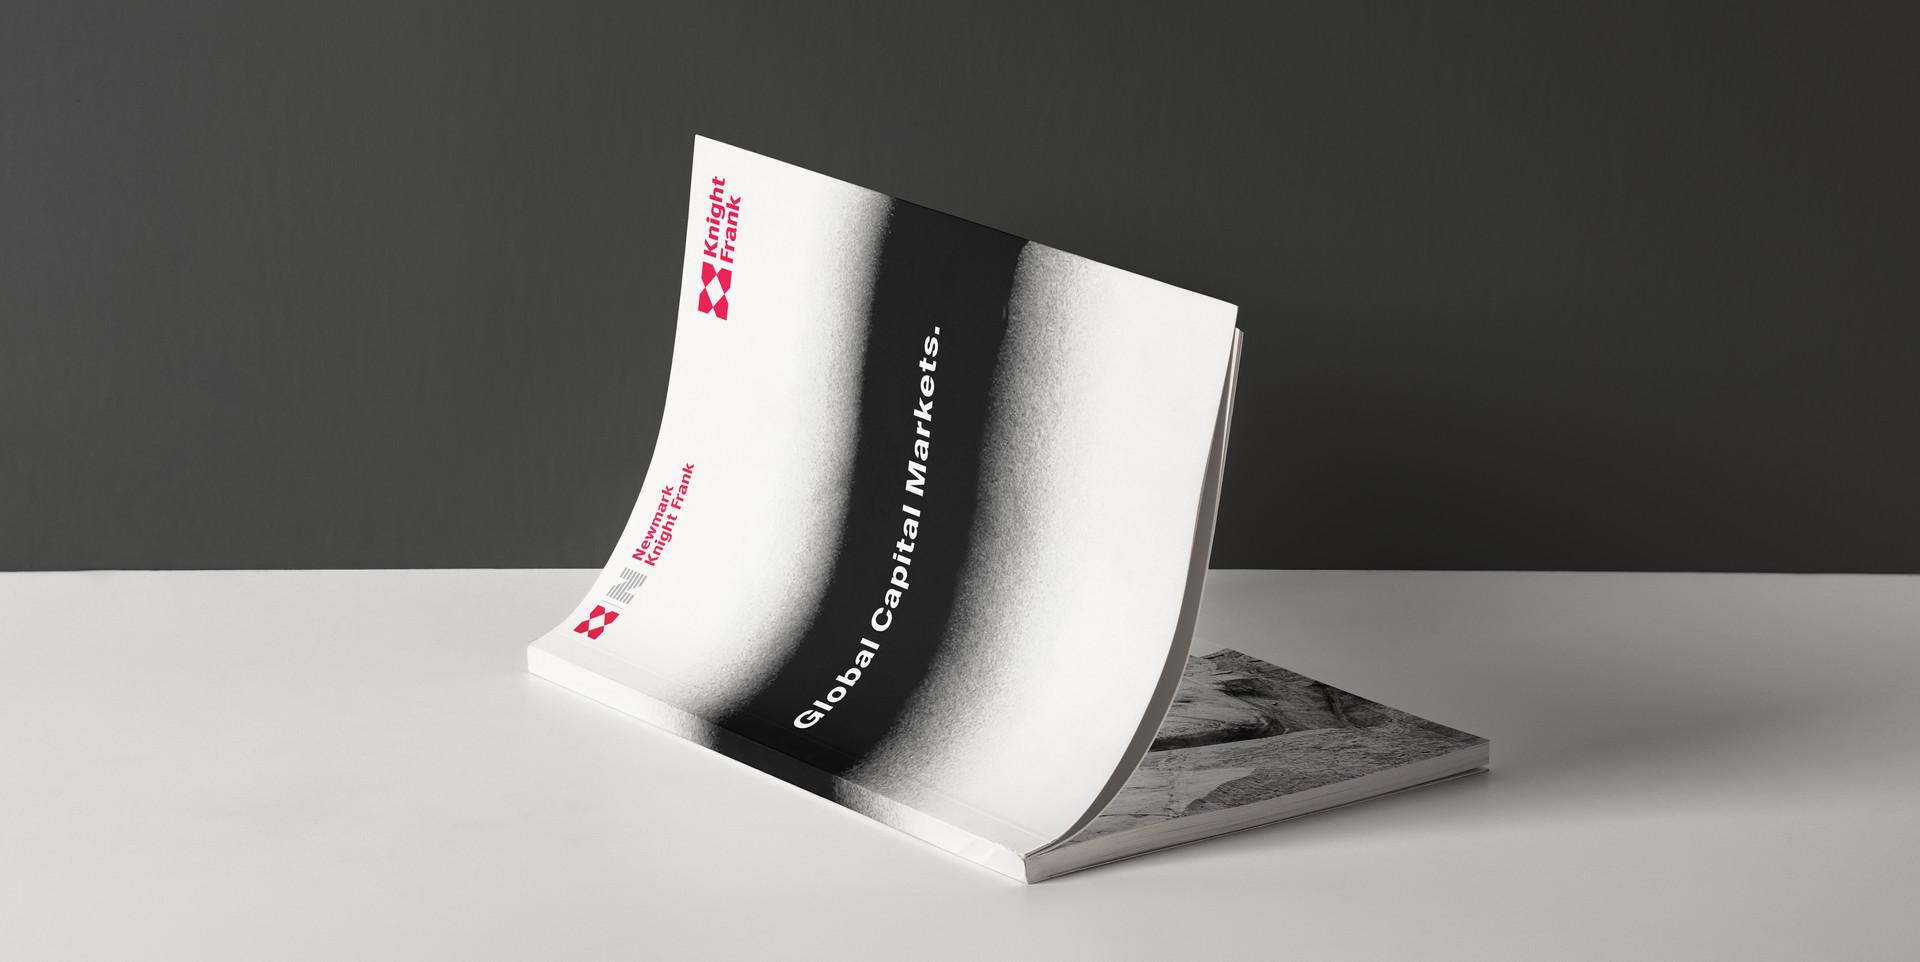 Cover-Magazine-Presentation-Mockup copy.